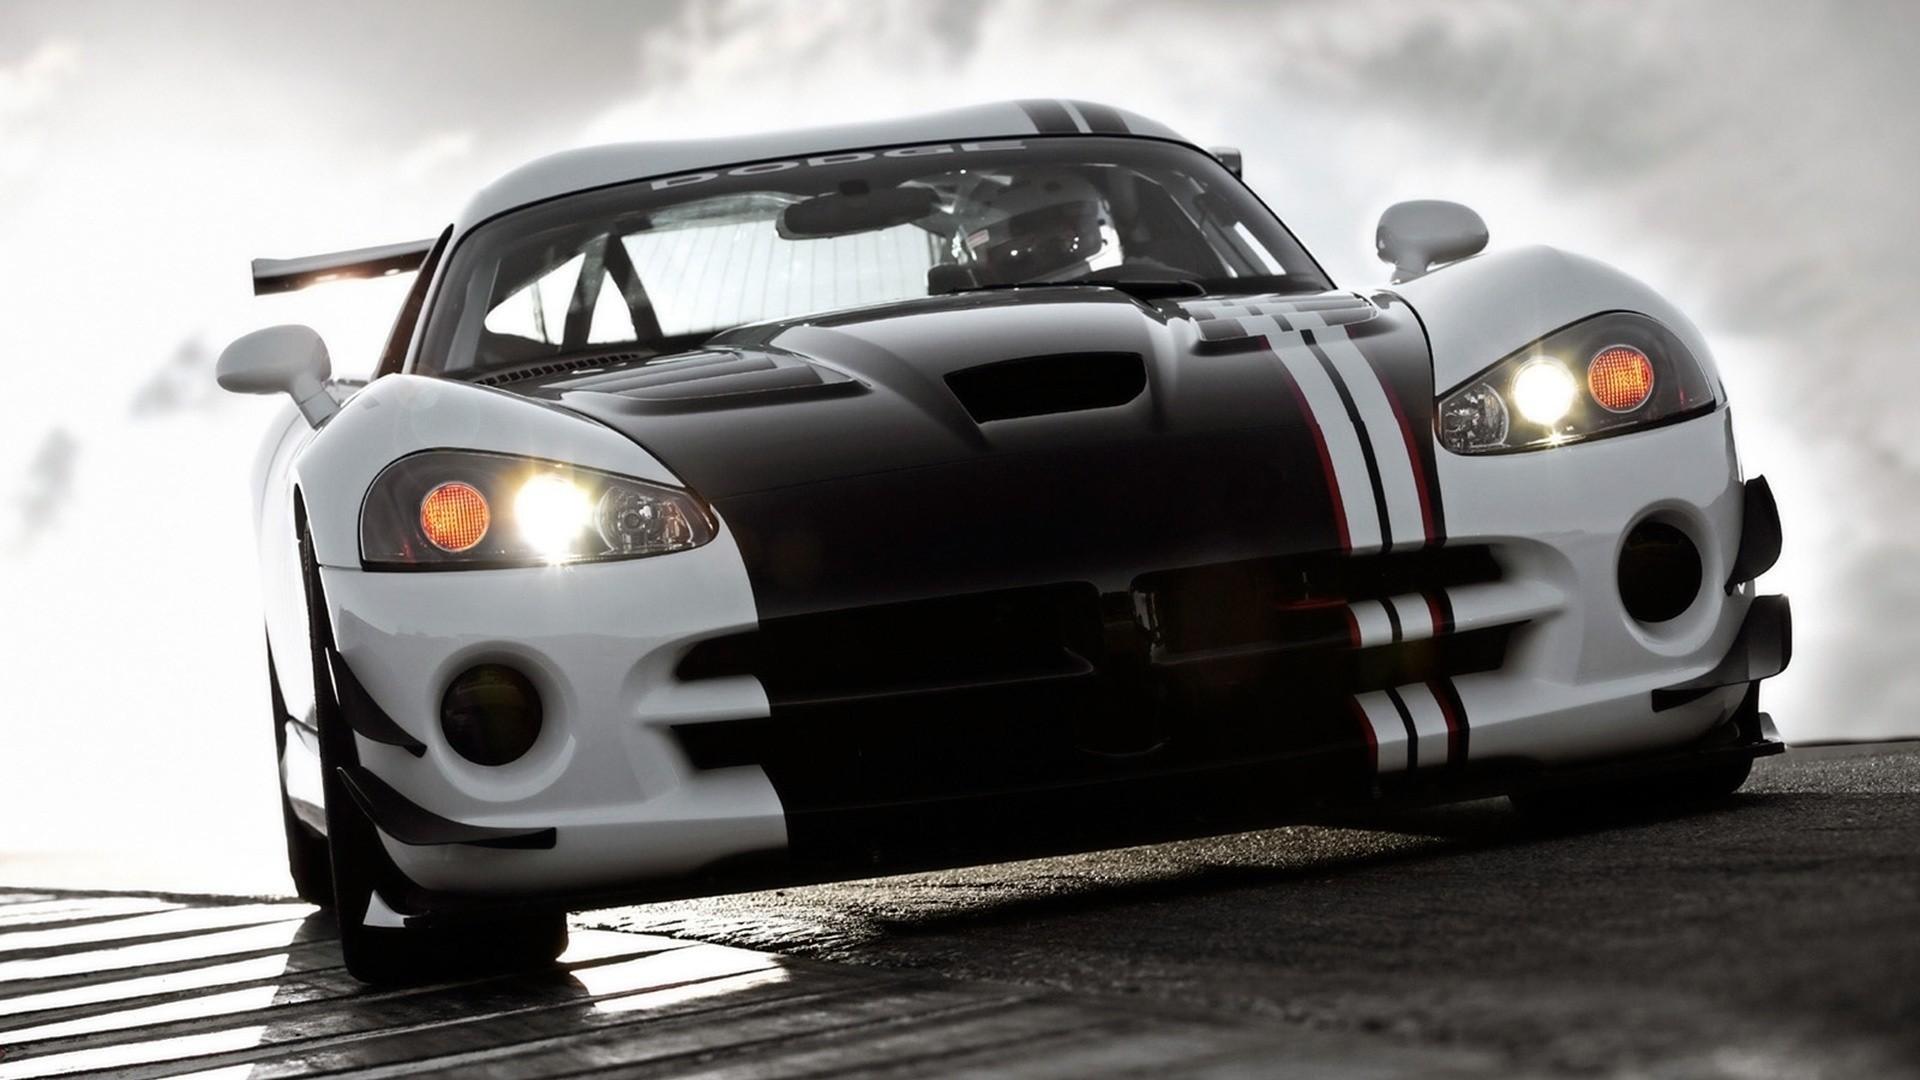 Dodge Viper Wallpaper Pic